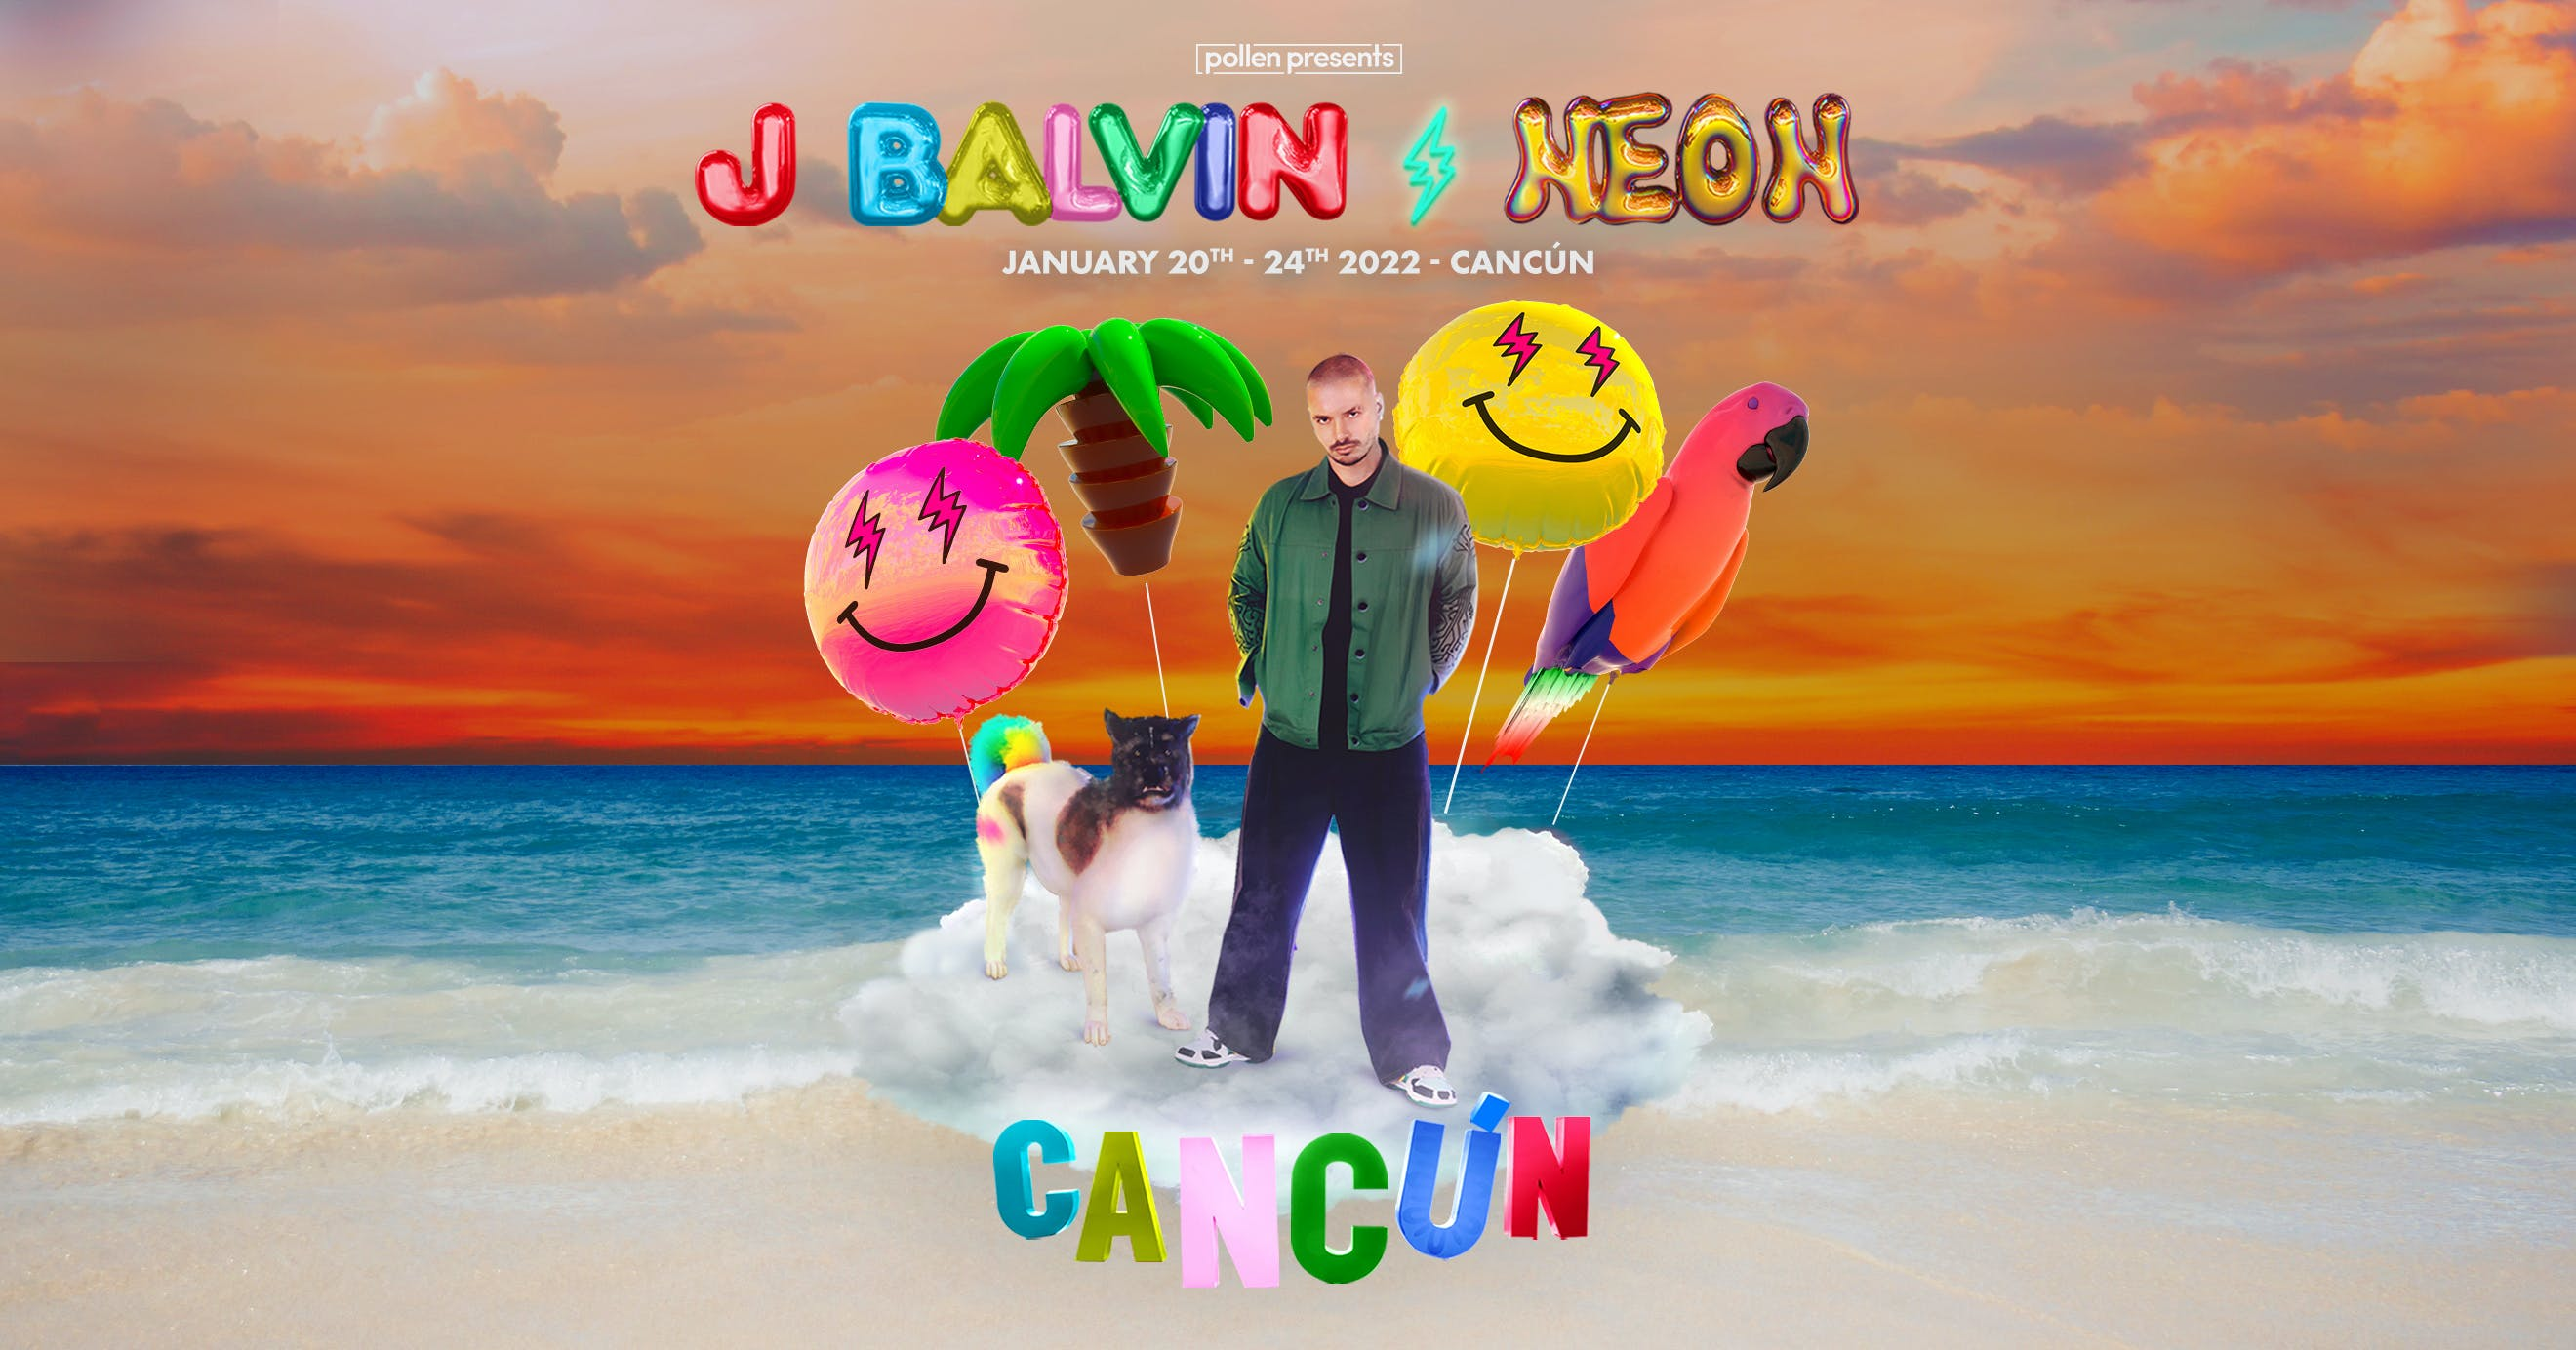 J Balvin Neon Cancún background